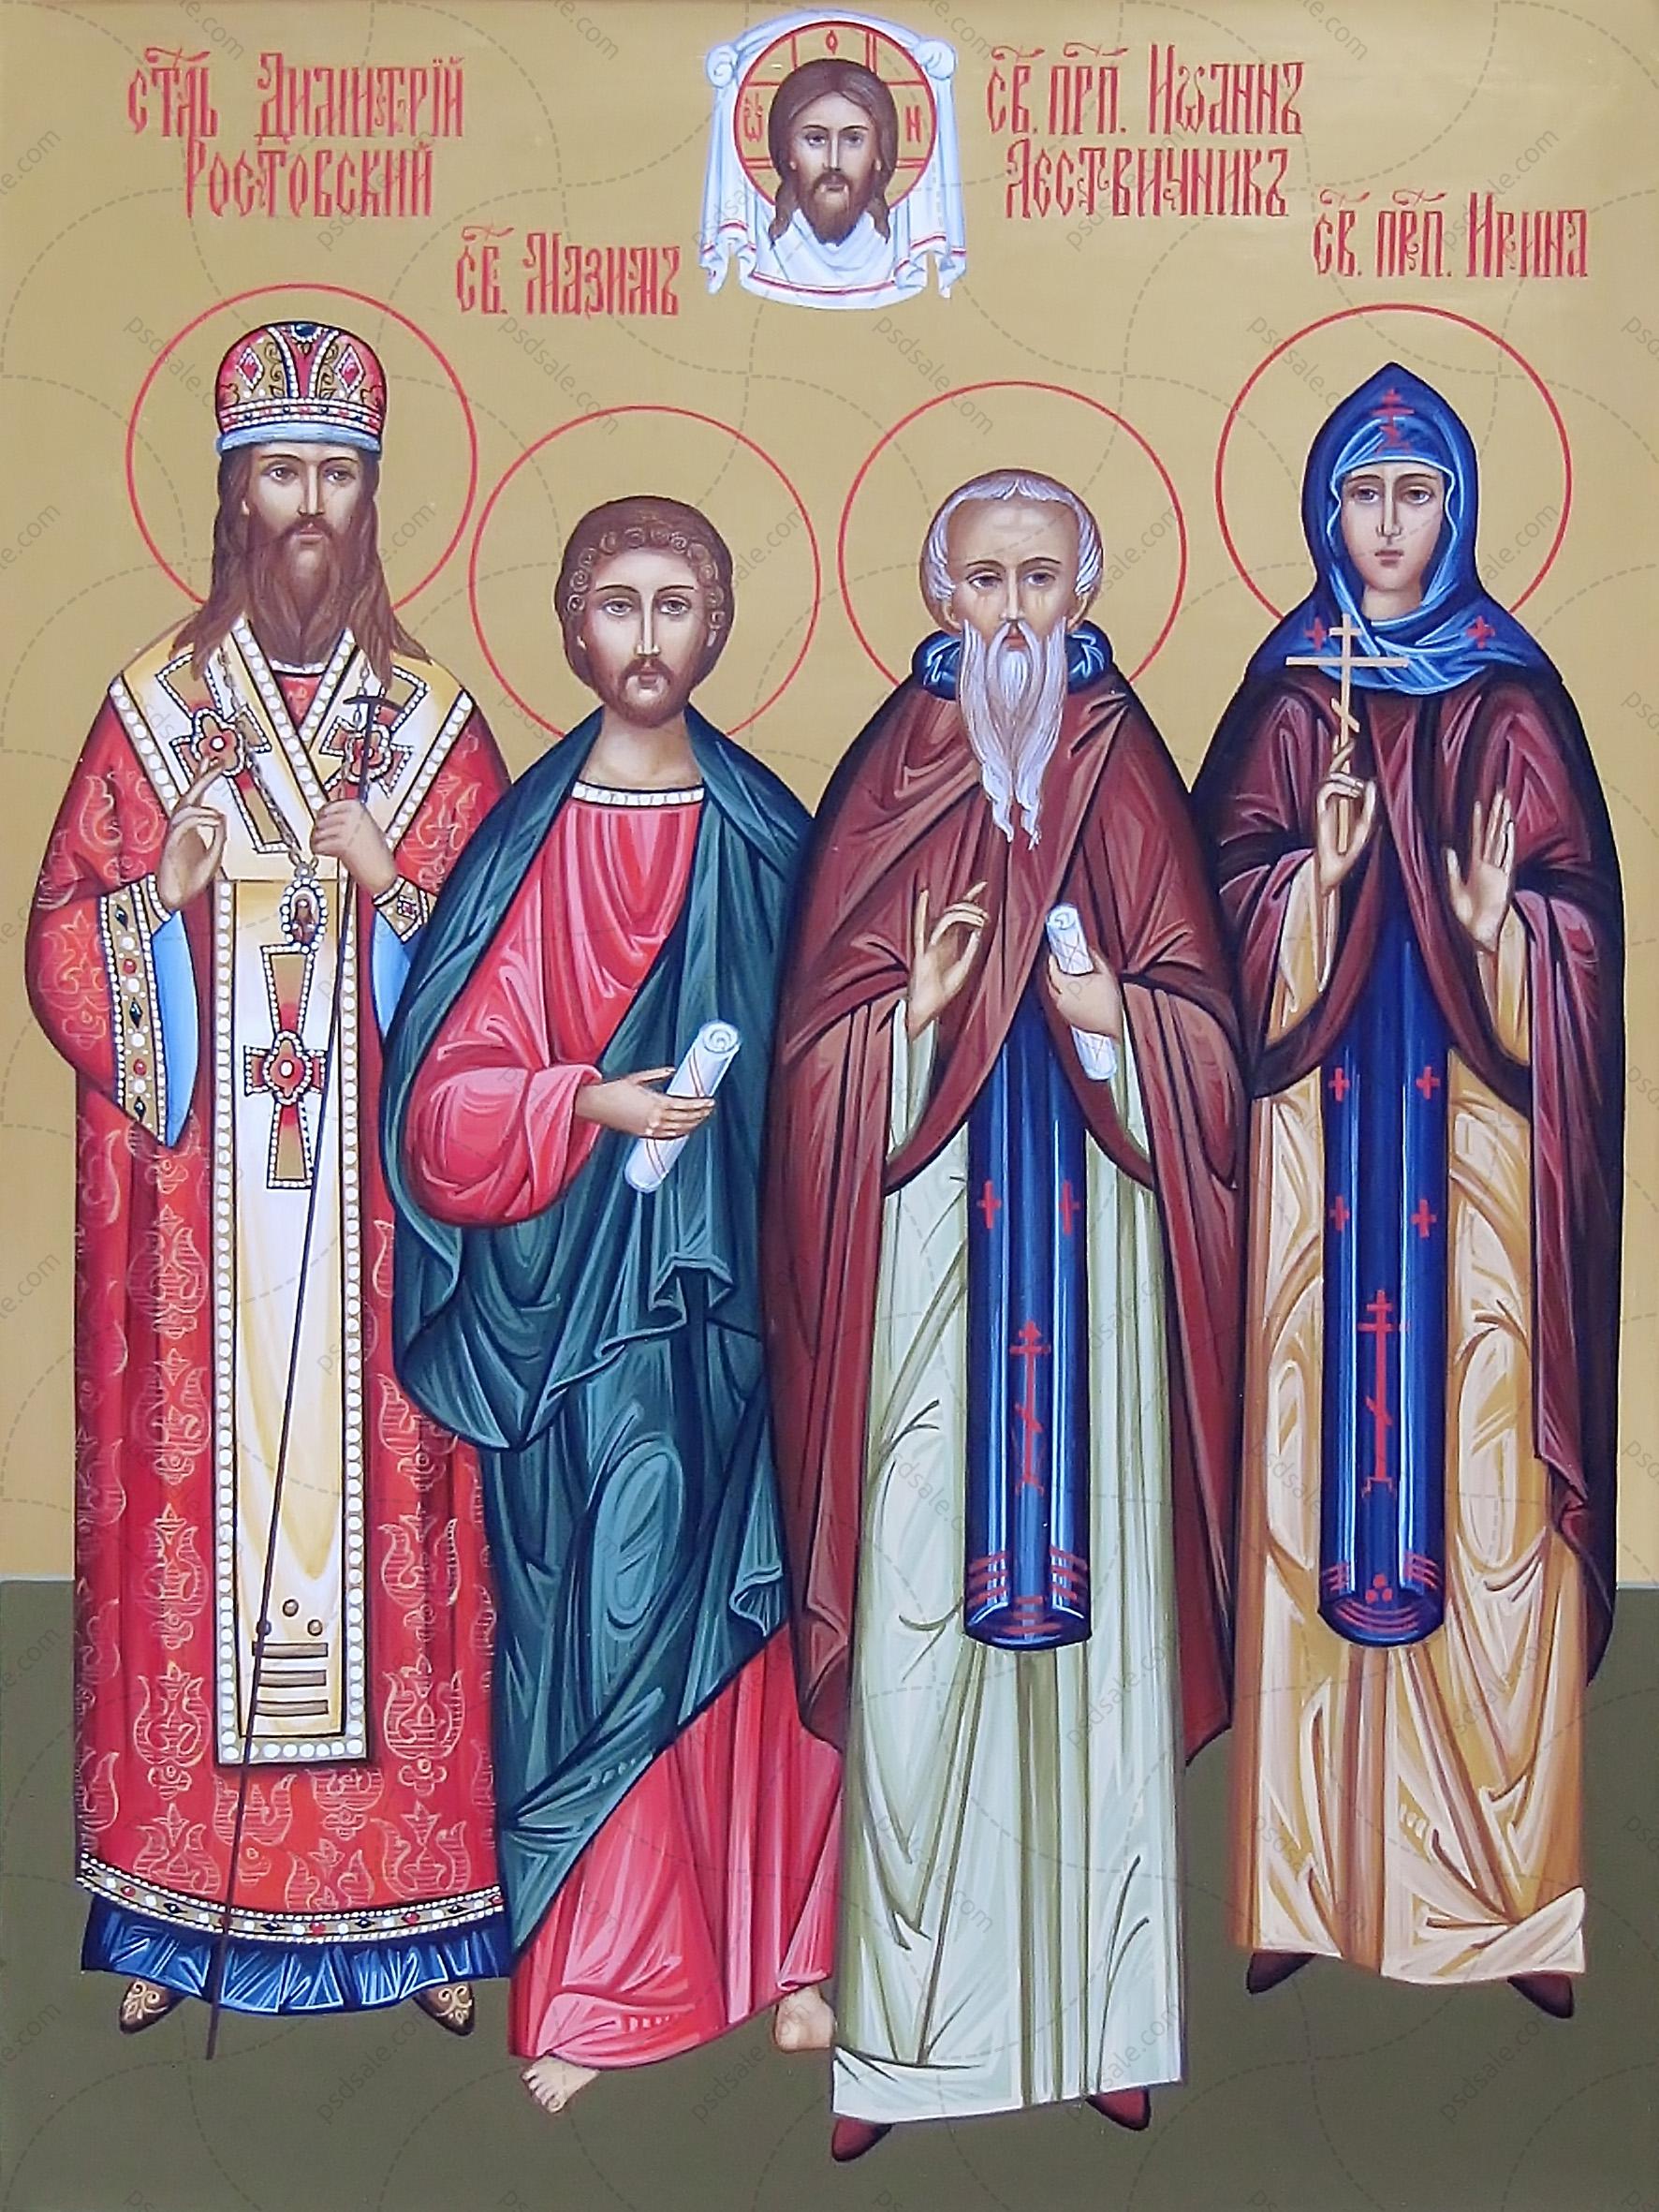 Дмитрий, Максим, Иоанн и Ирина